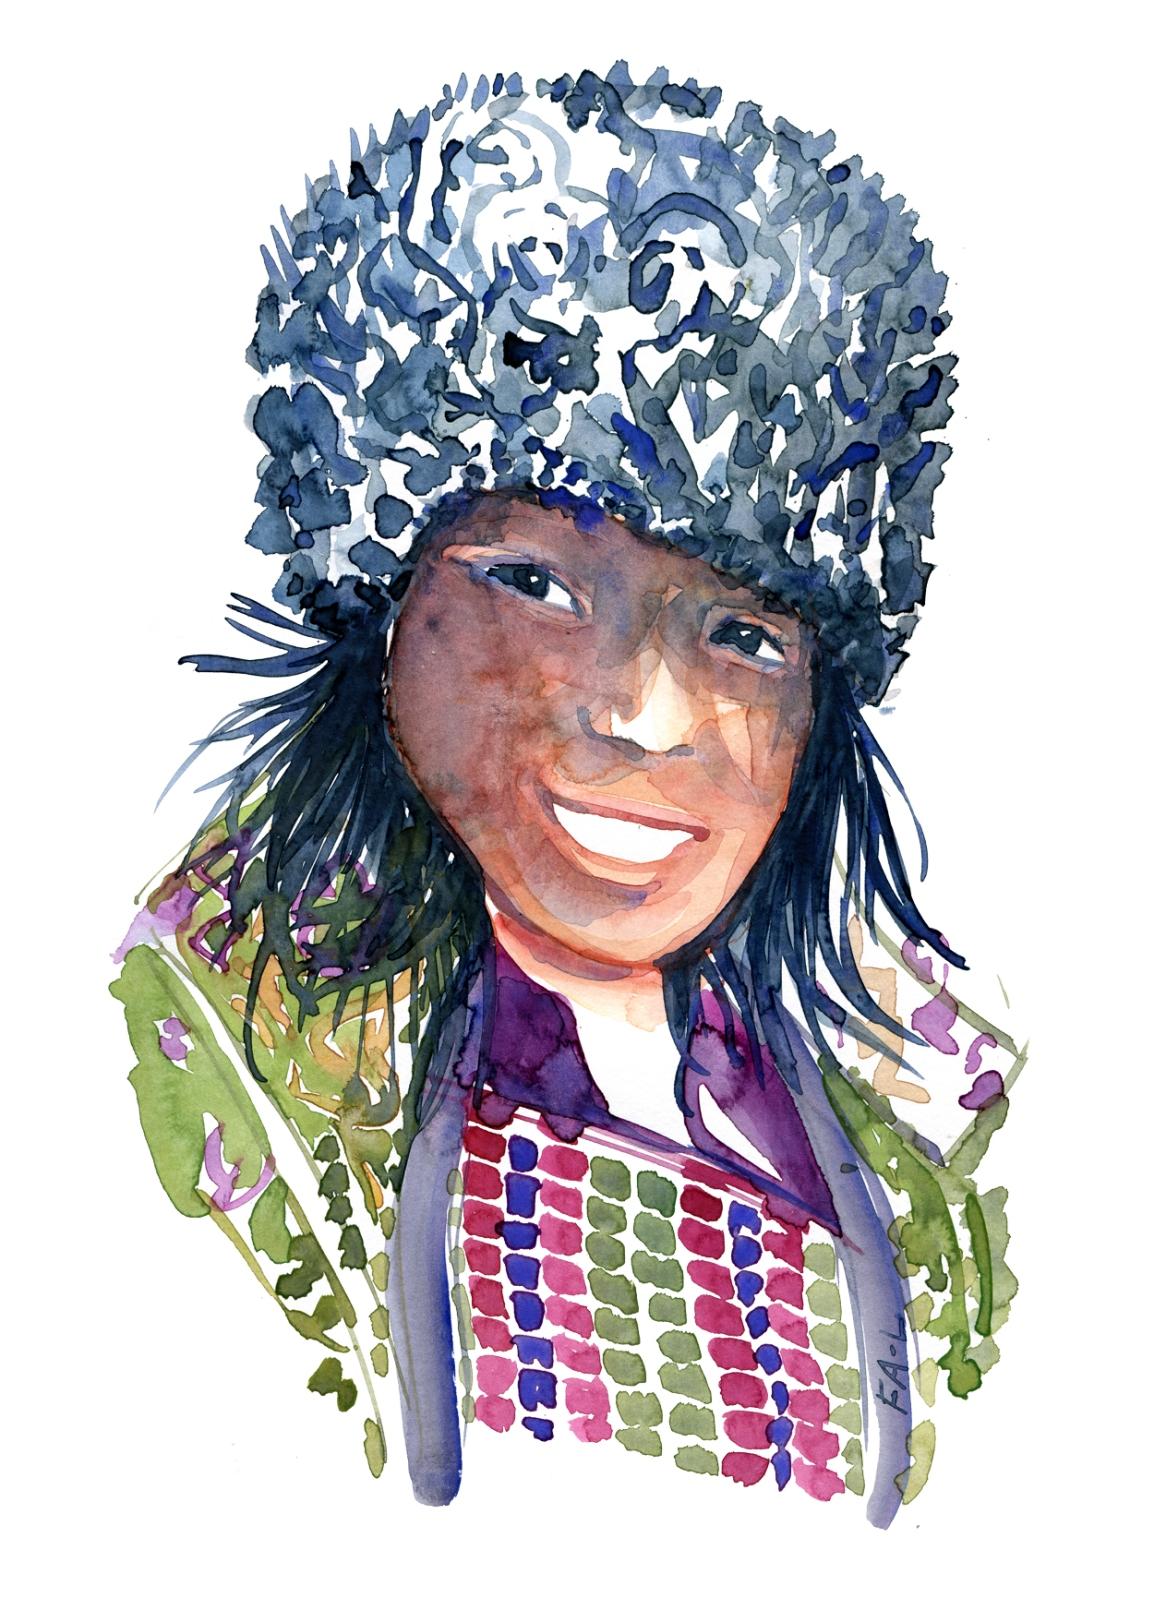 Bhutan woman Watercolor by Frits Ahlefeldt